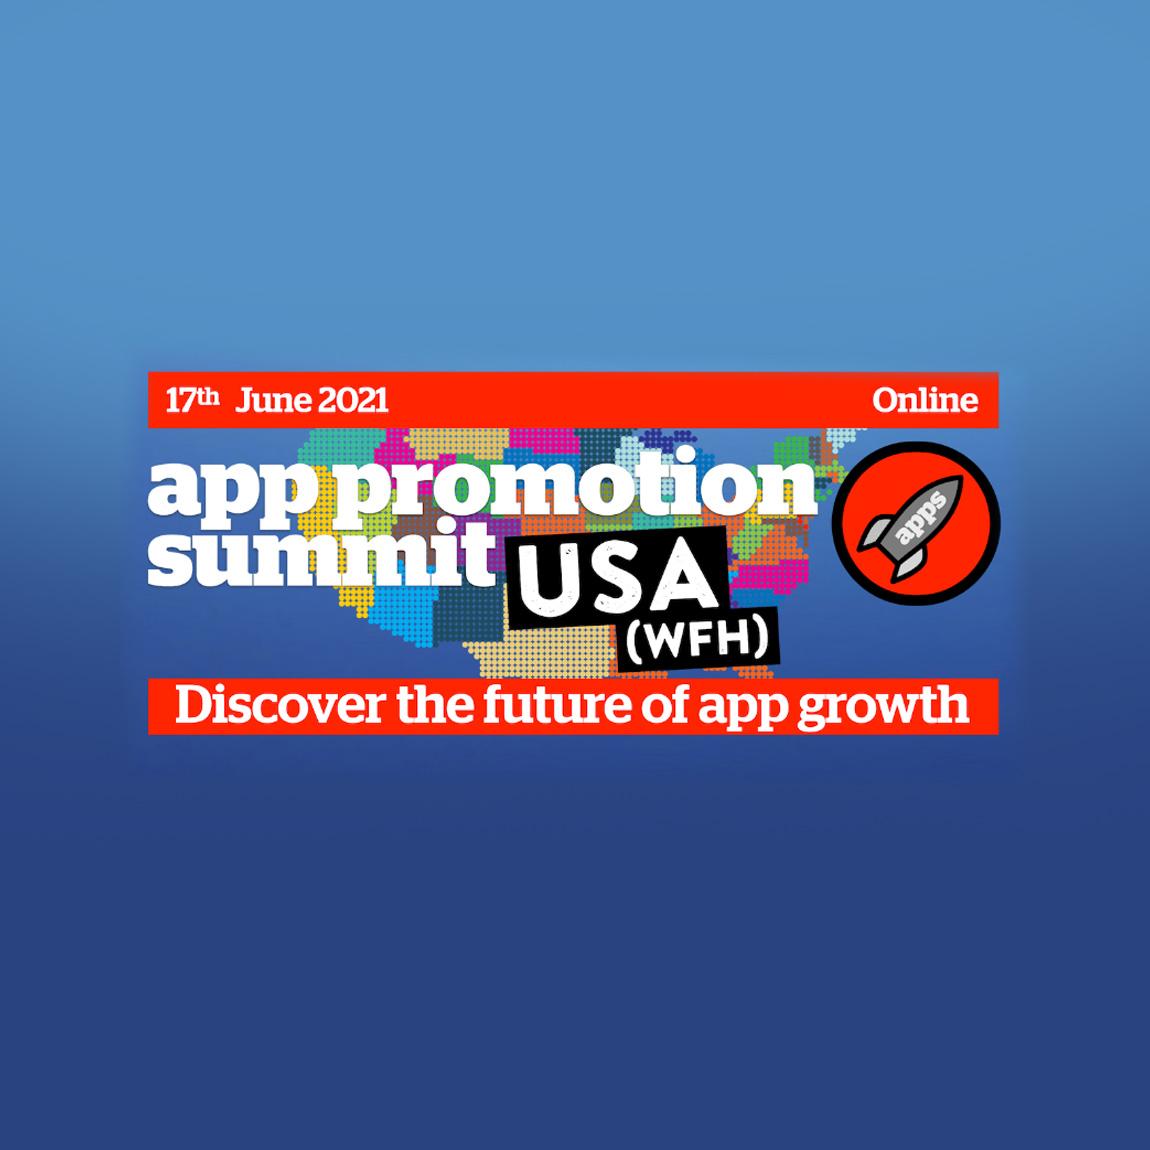 App Promotion Summit: USA (WFH)